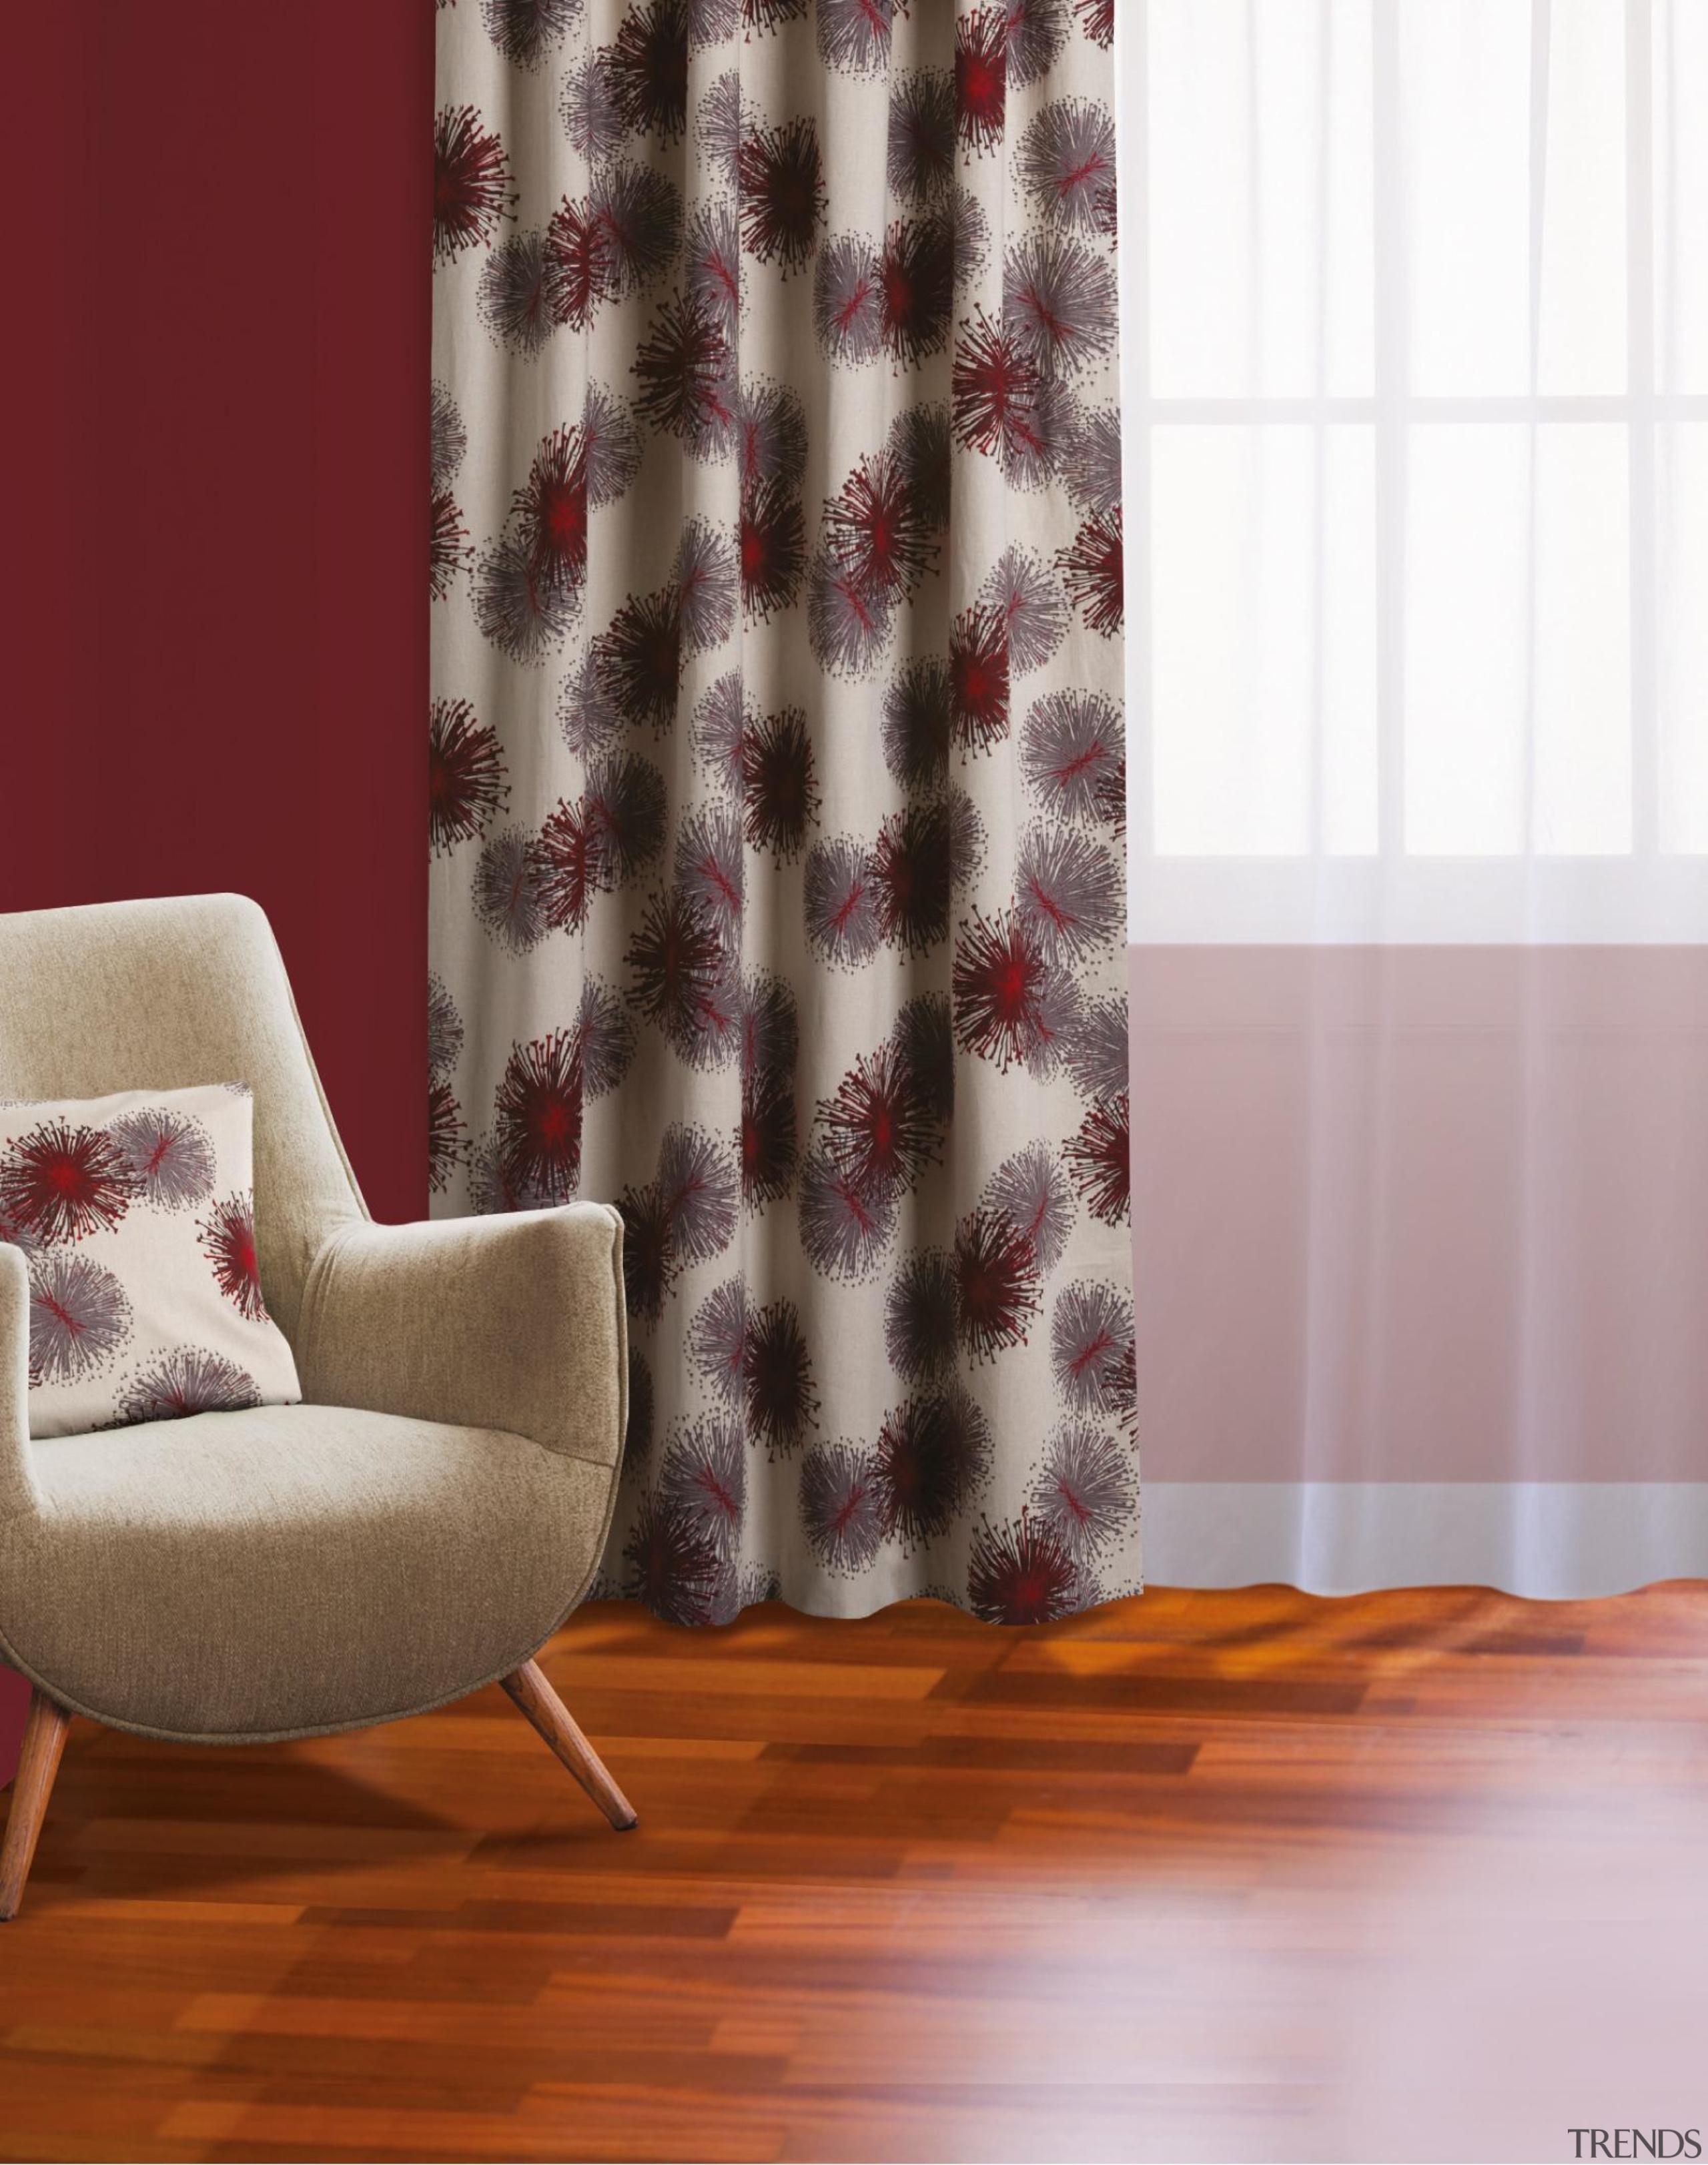 Artiste - curtain | decor | floor | curtain, decor, floor, flooring, interior design, textile, window, window covering, window treatment, gray